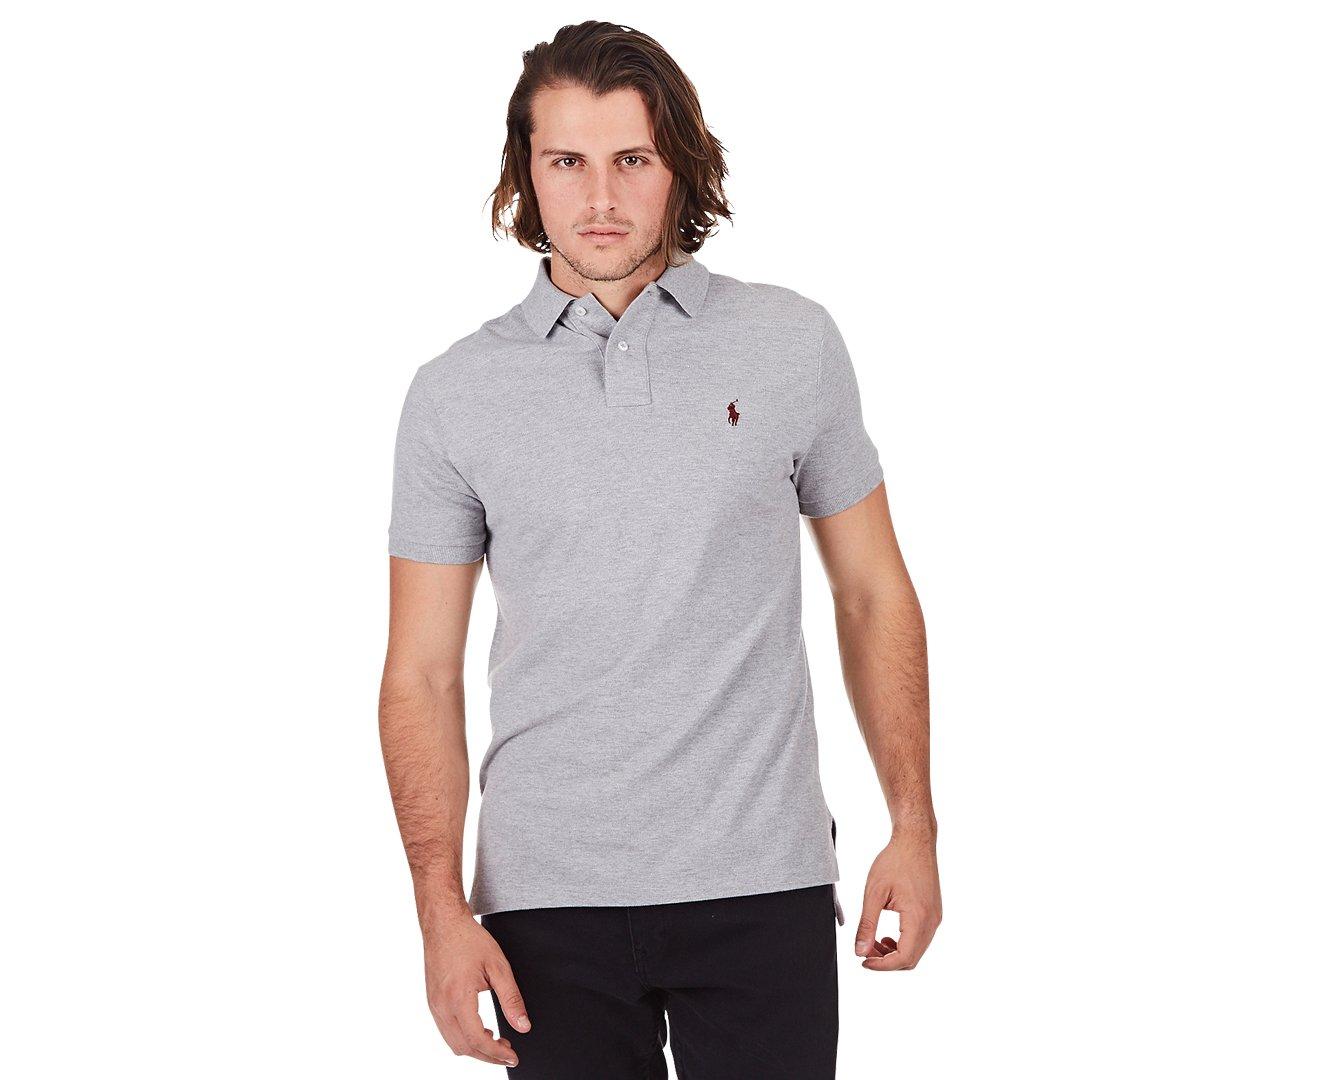 RALPH LAUREN Polo Raulph Lauren Custom Fit Short Sleeve Shirt (Medium, Andover Heather)